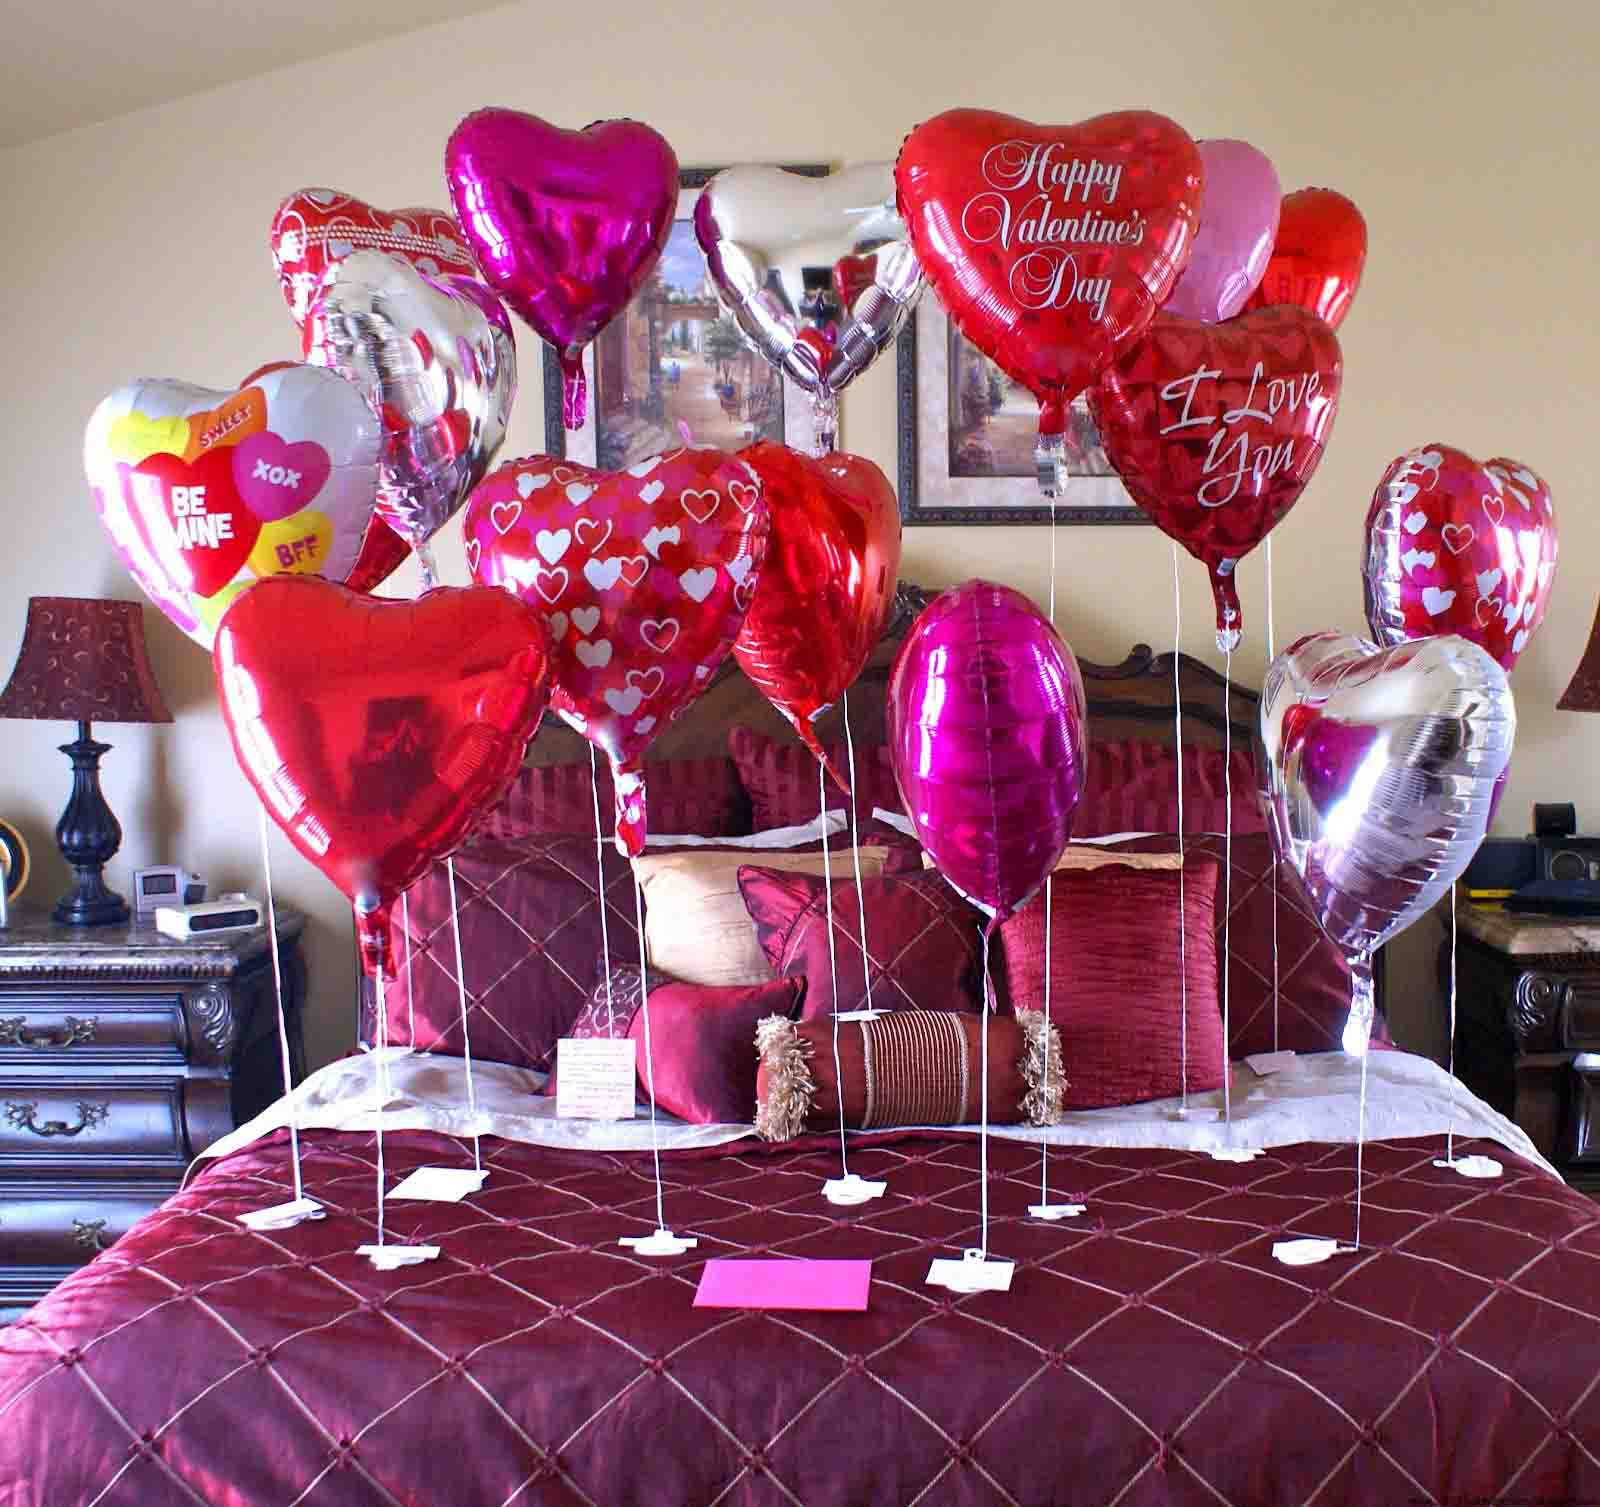 Cute Valentine Hearts for Room Decor